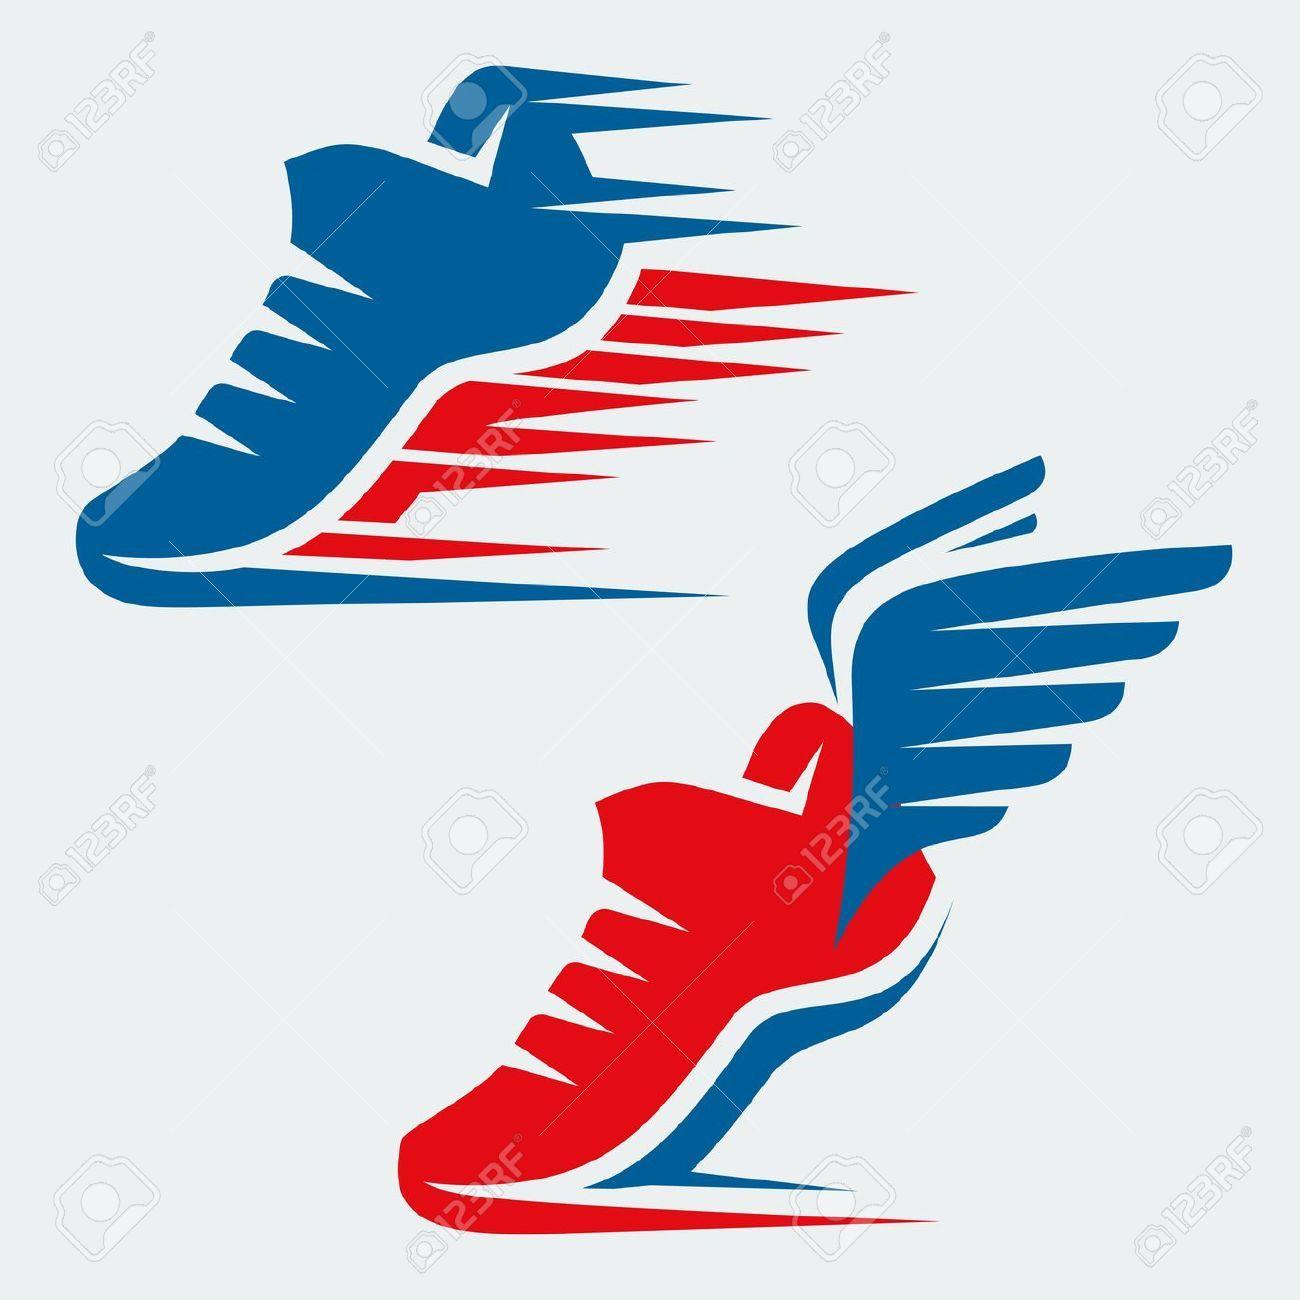 running shoe logo - Google Search